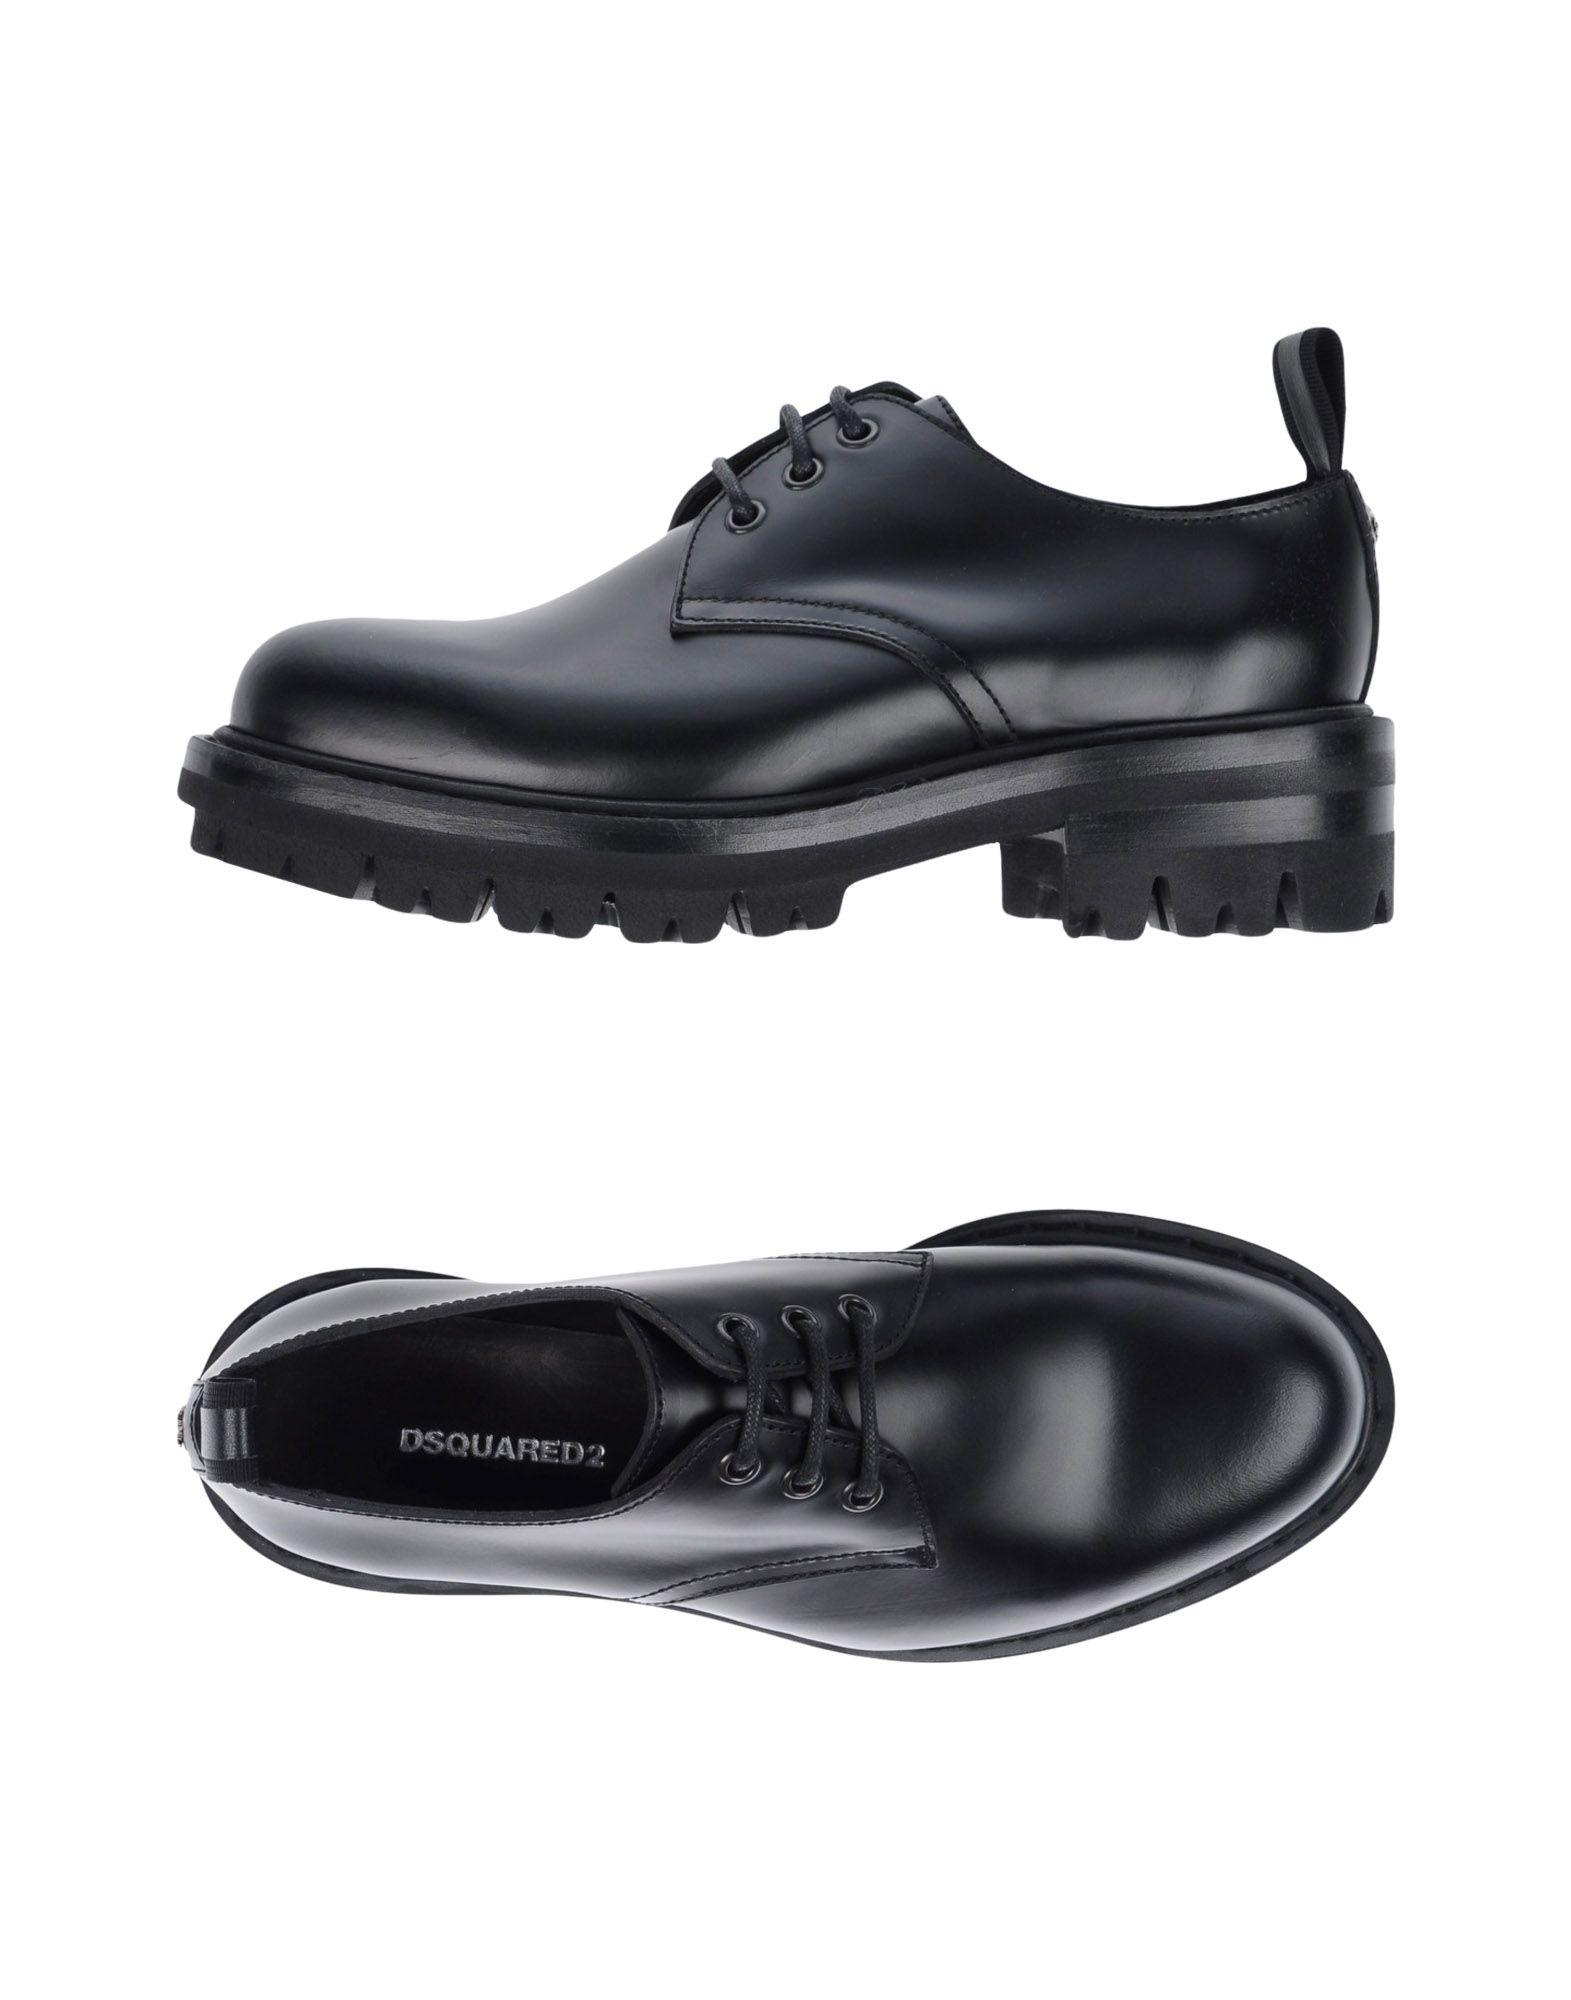 Rabatt Schuhe Dsquared2 Schnürschuhe Damen  11299361WS